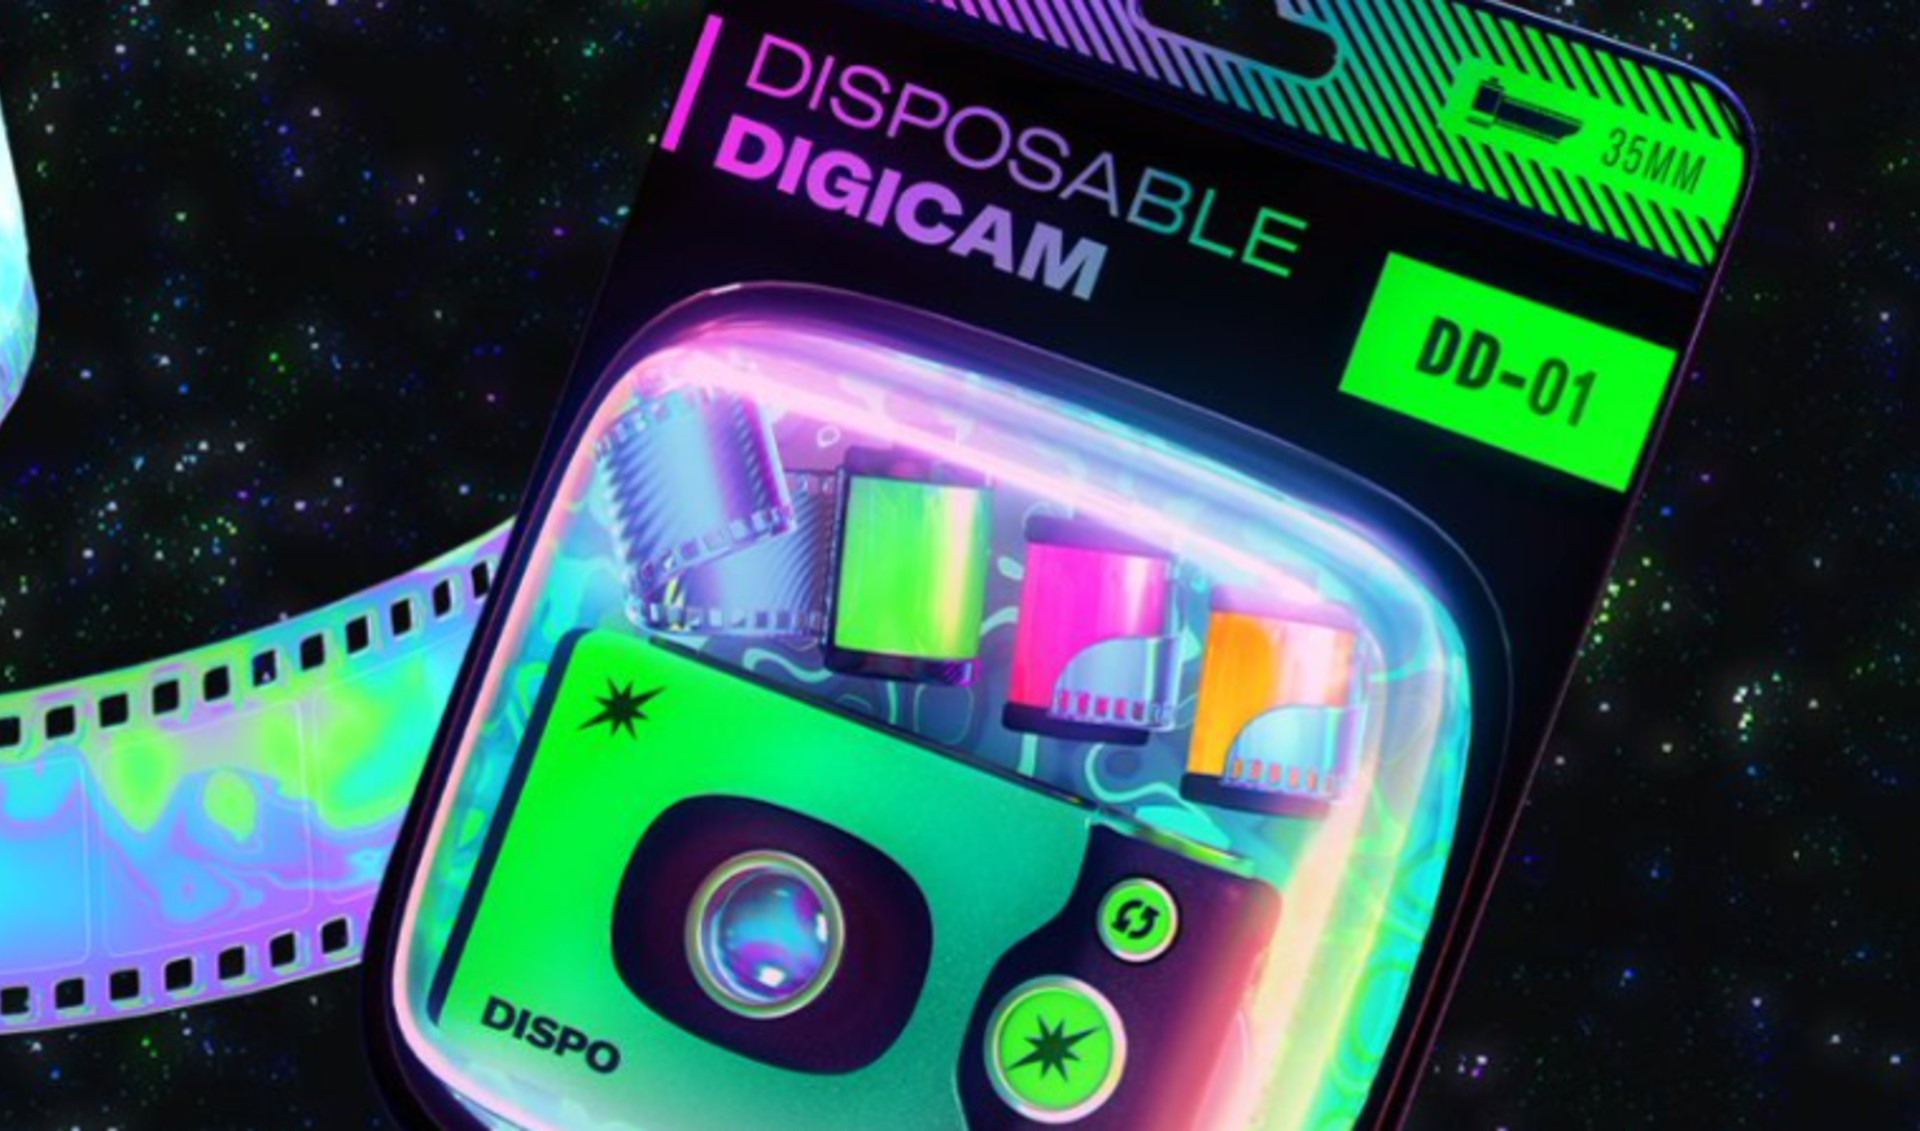 David Dobrik-Less Dispo Closes Series A Featuring Investor-Advisors Annie Leibovitz, Kevin Durant, More